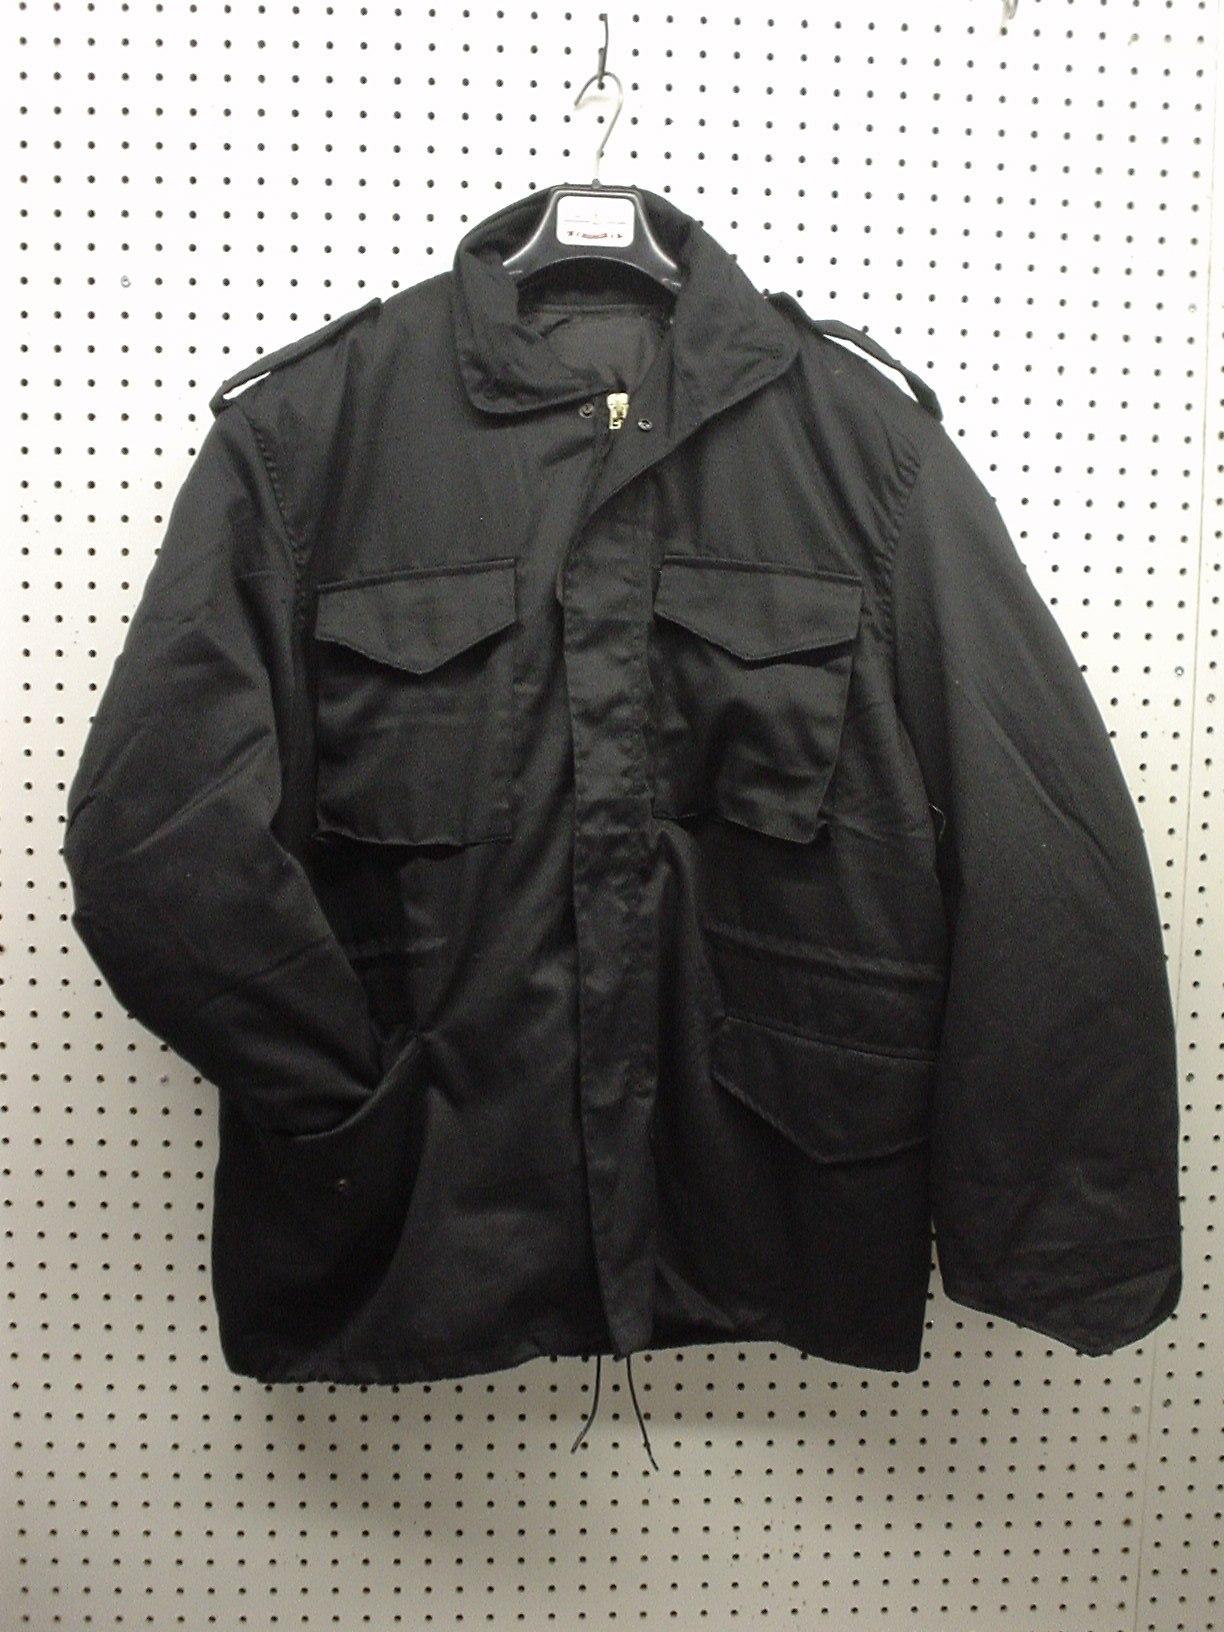 Black M-65 jacket